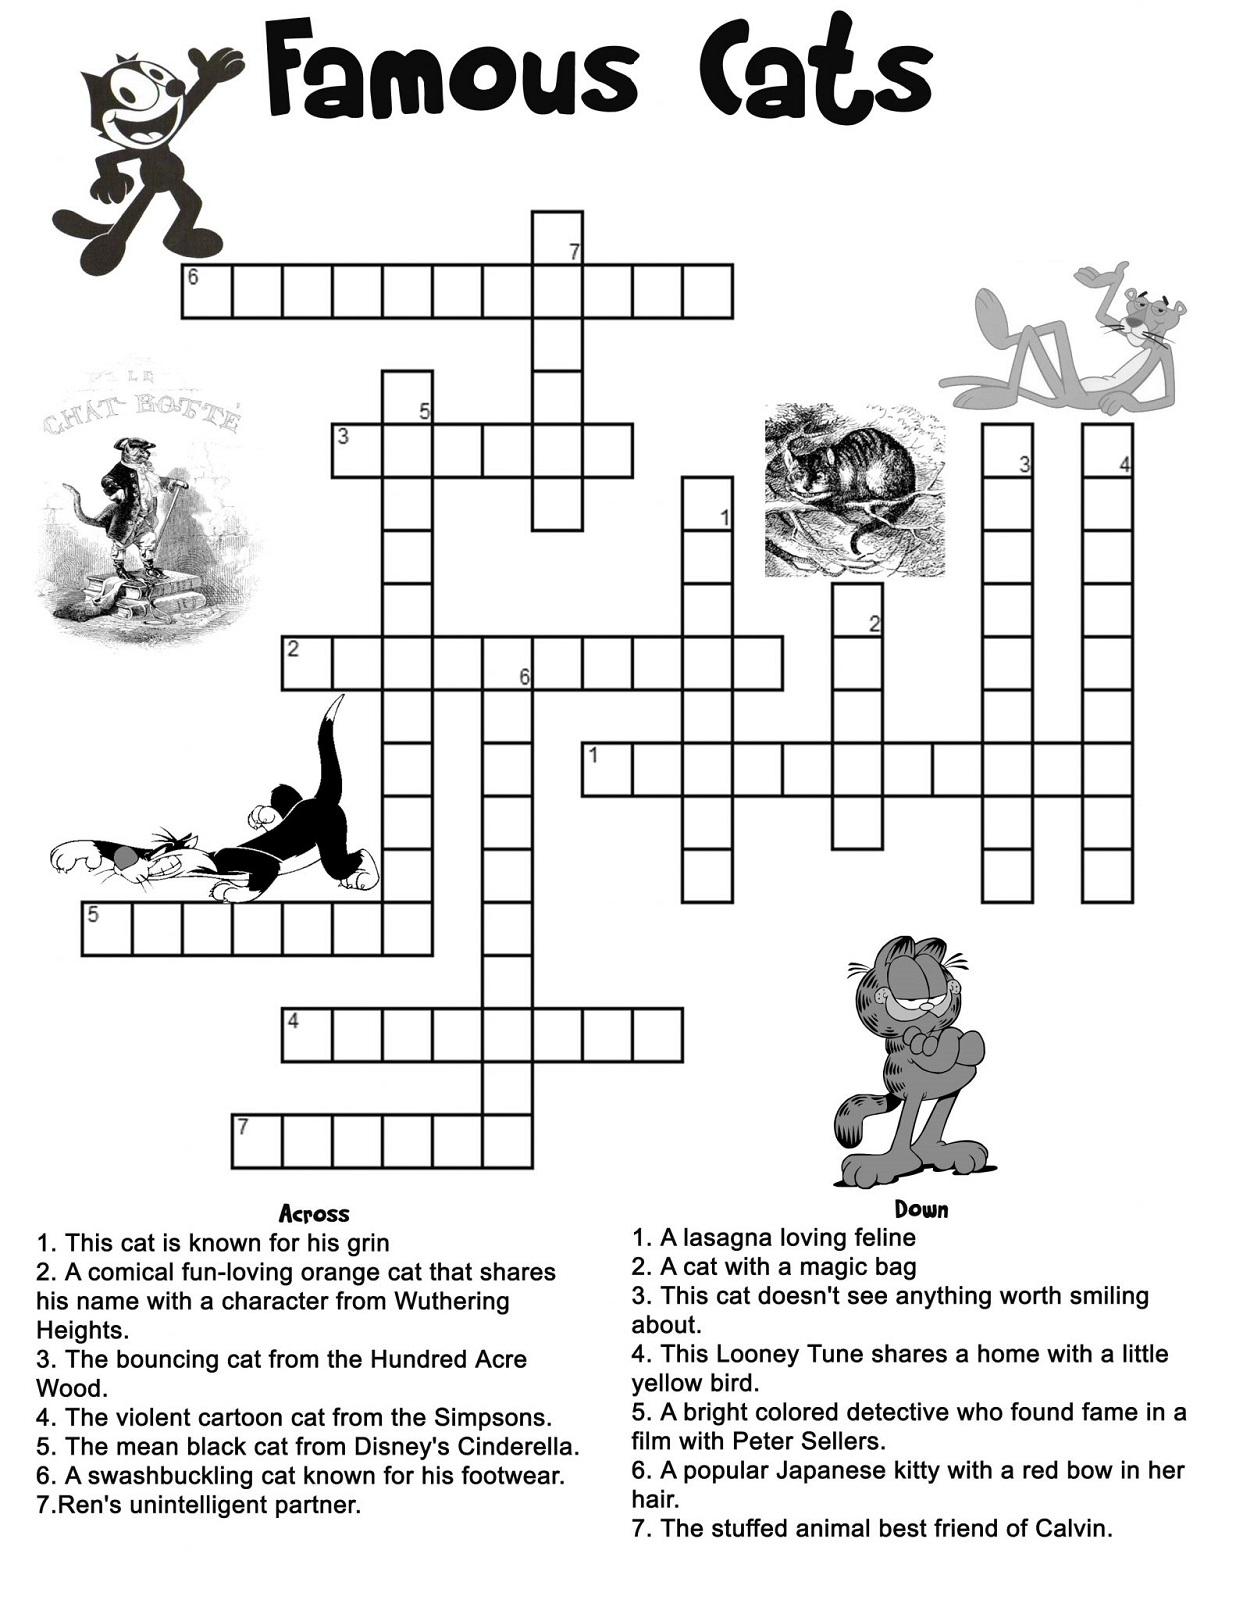 Kids' Crossword Puzzles To Print | Activity Shelter - Printable Cartoon Crossword Puzzles